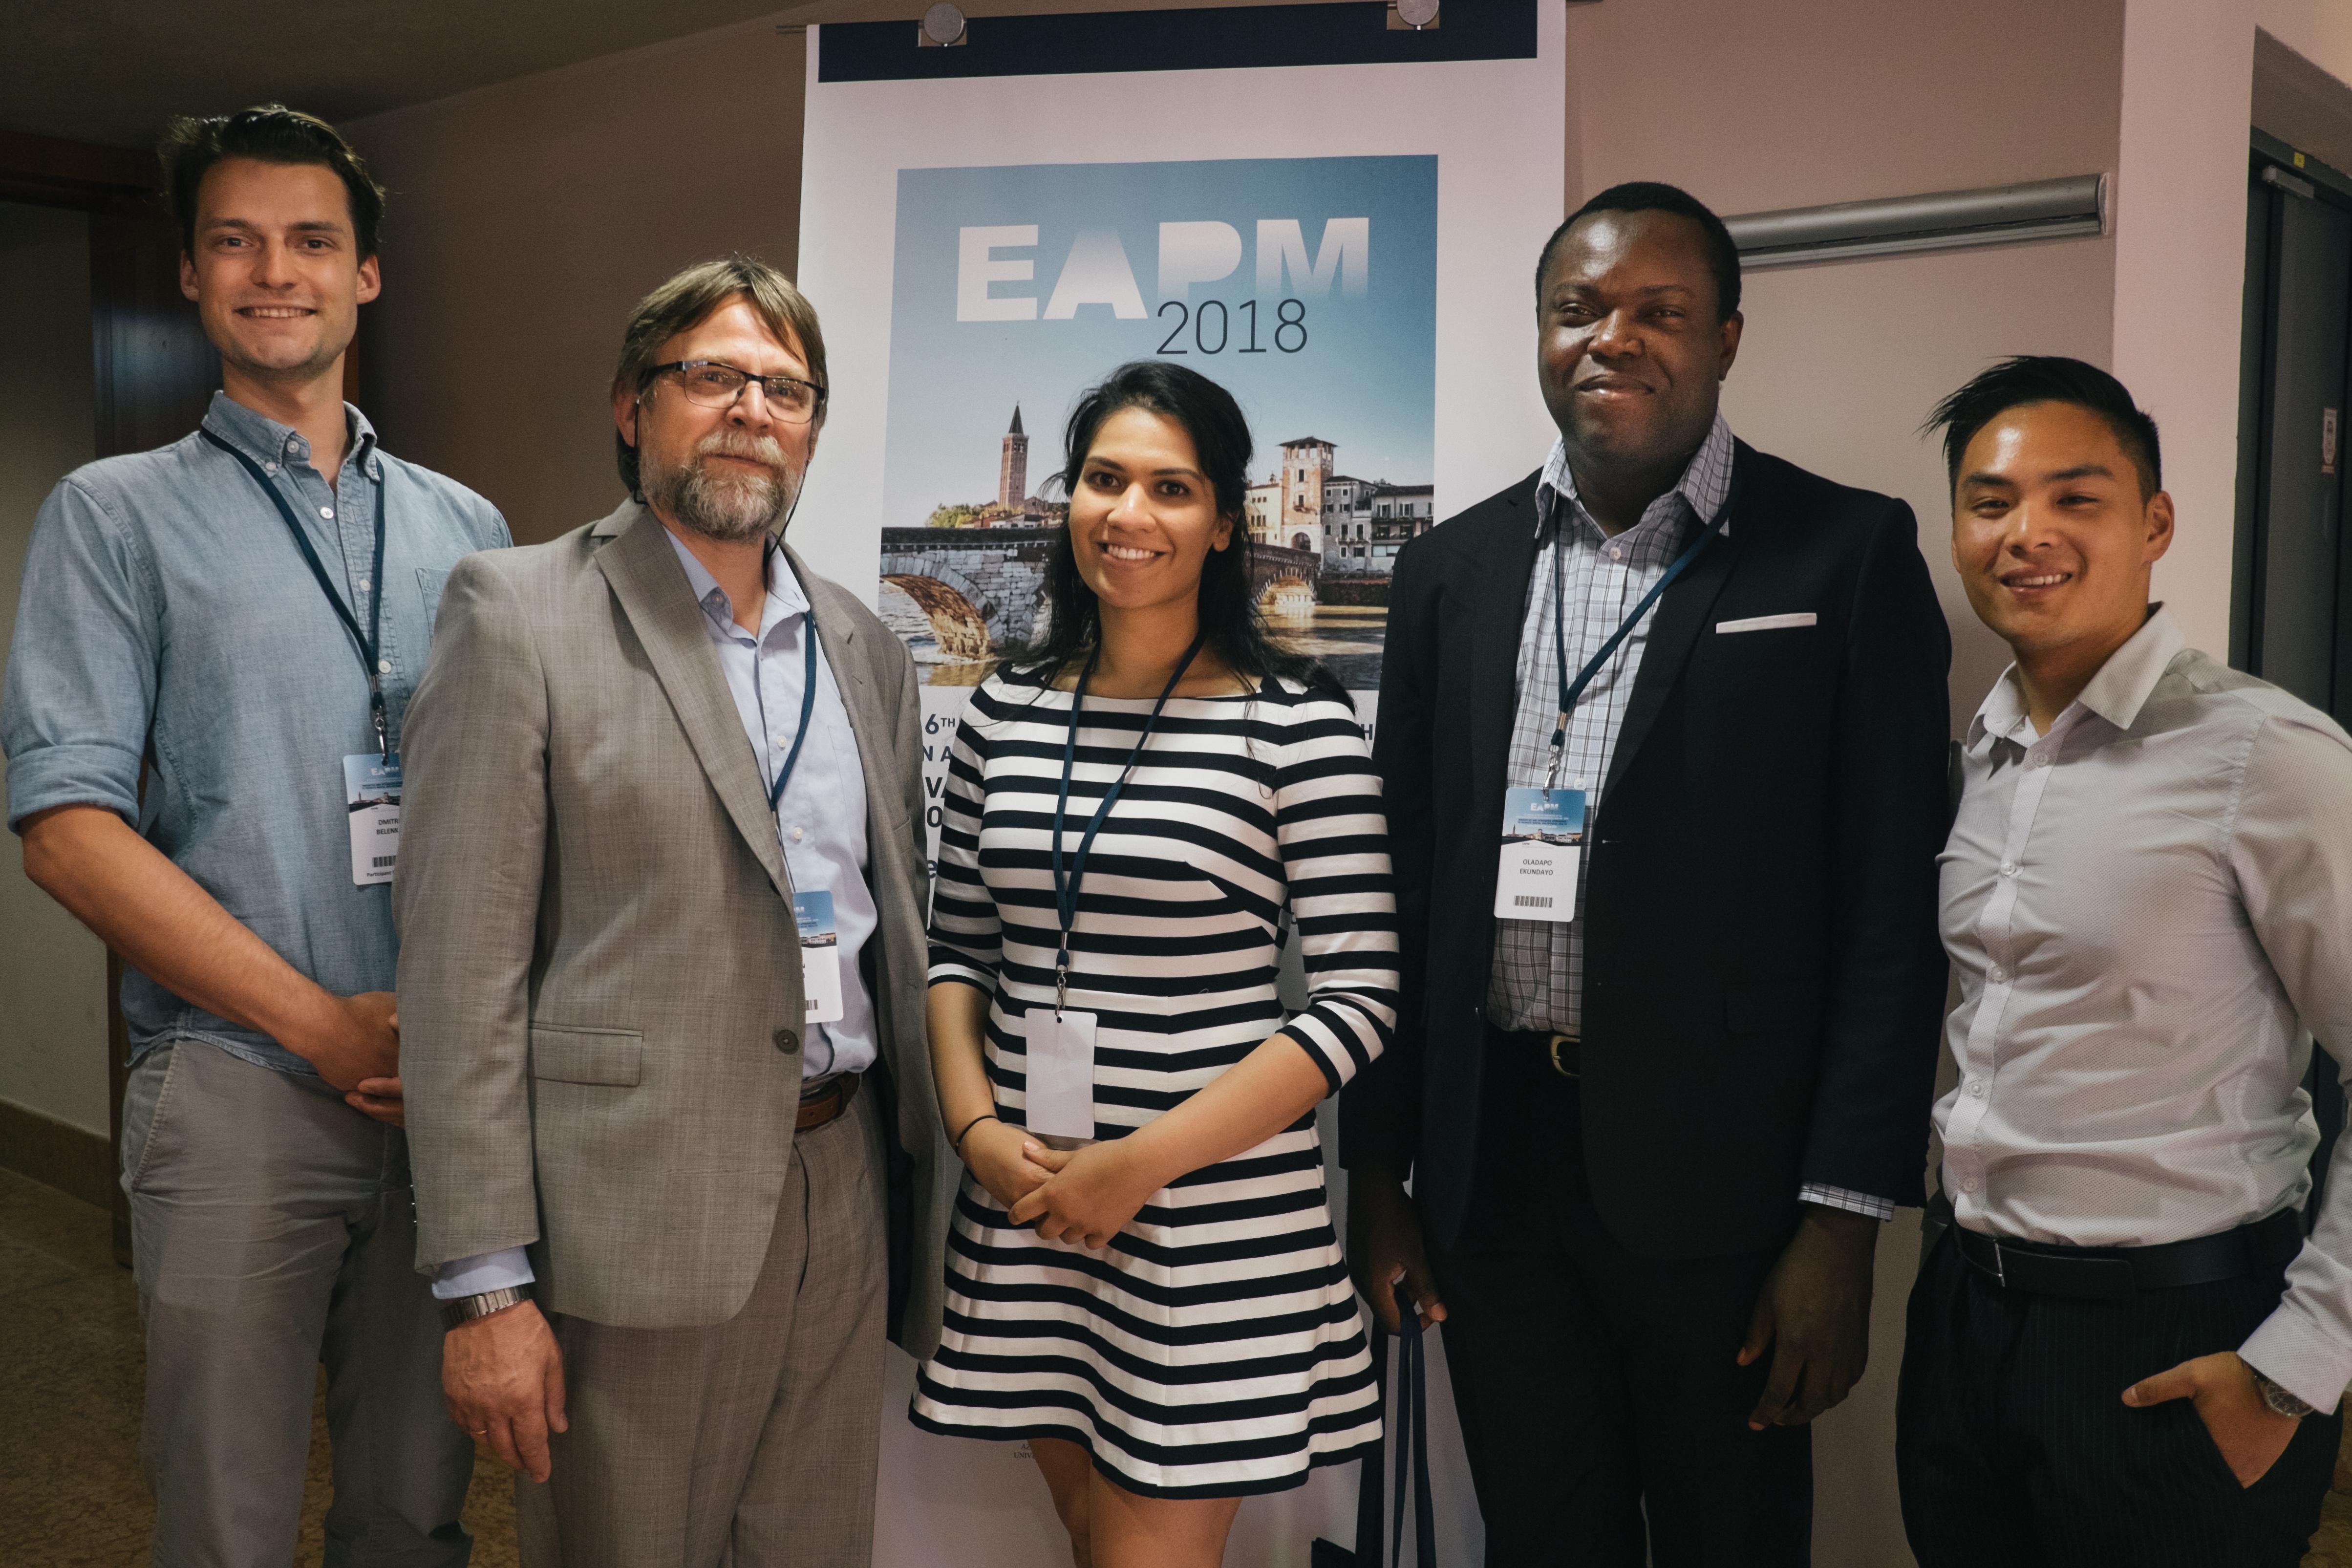 Dmitri Belenko, Dr. Istvan Mucsi, Aarushi Bansal, Oladapo Ekundayo, and Evan Tang at the EAPM 2018